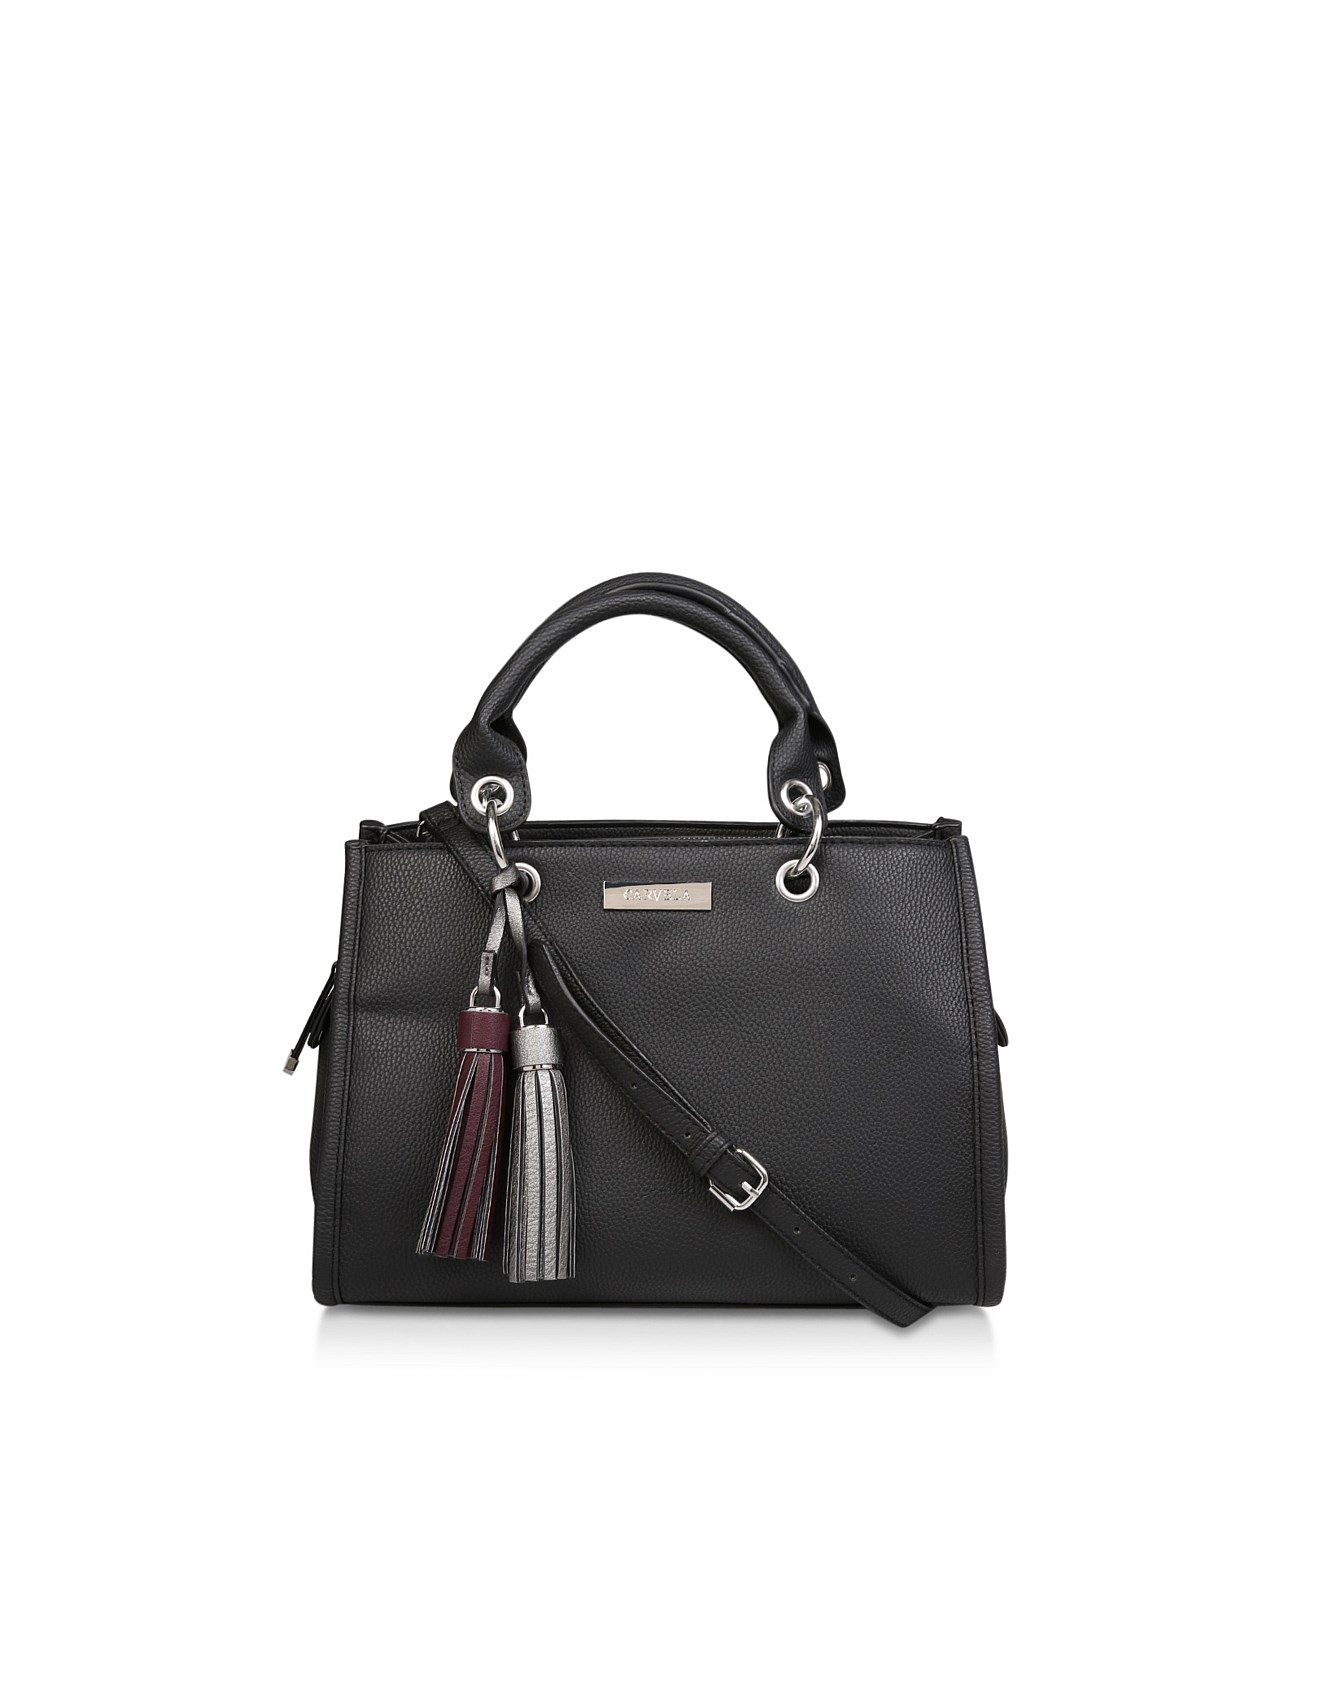 1611145d94b CARVELA-SIENNA SLOUCH BAG-BLACK